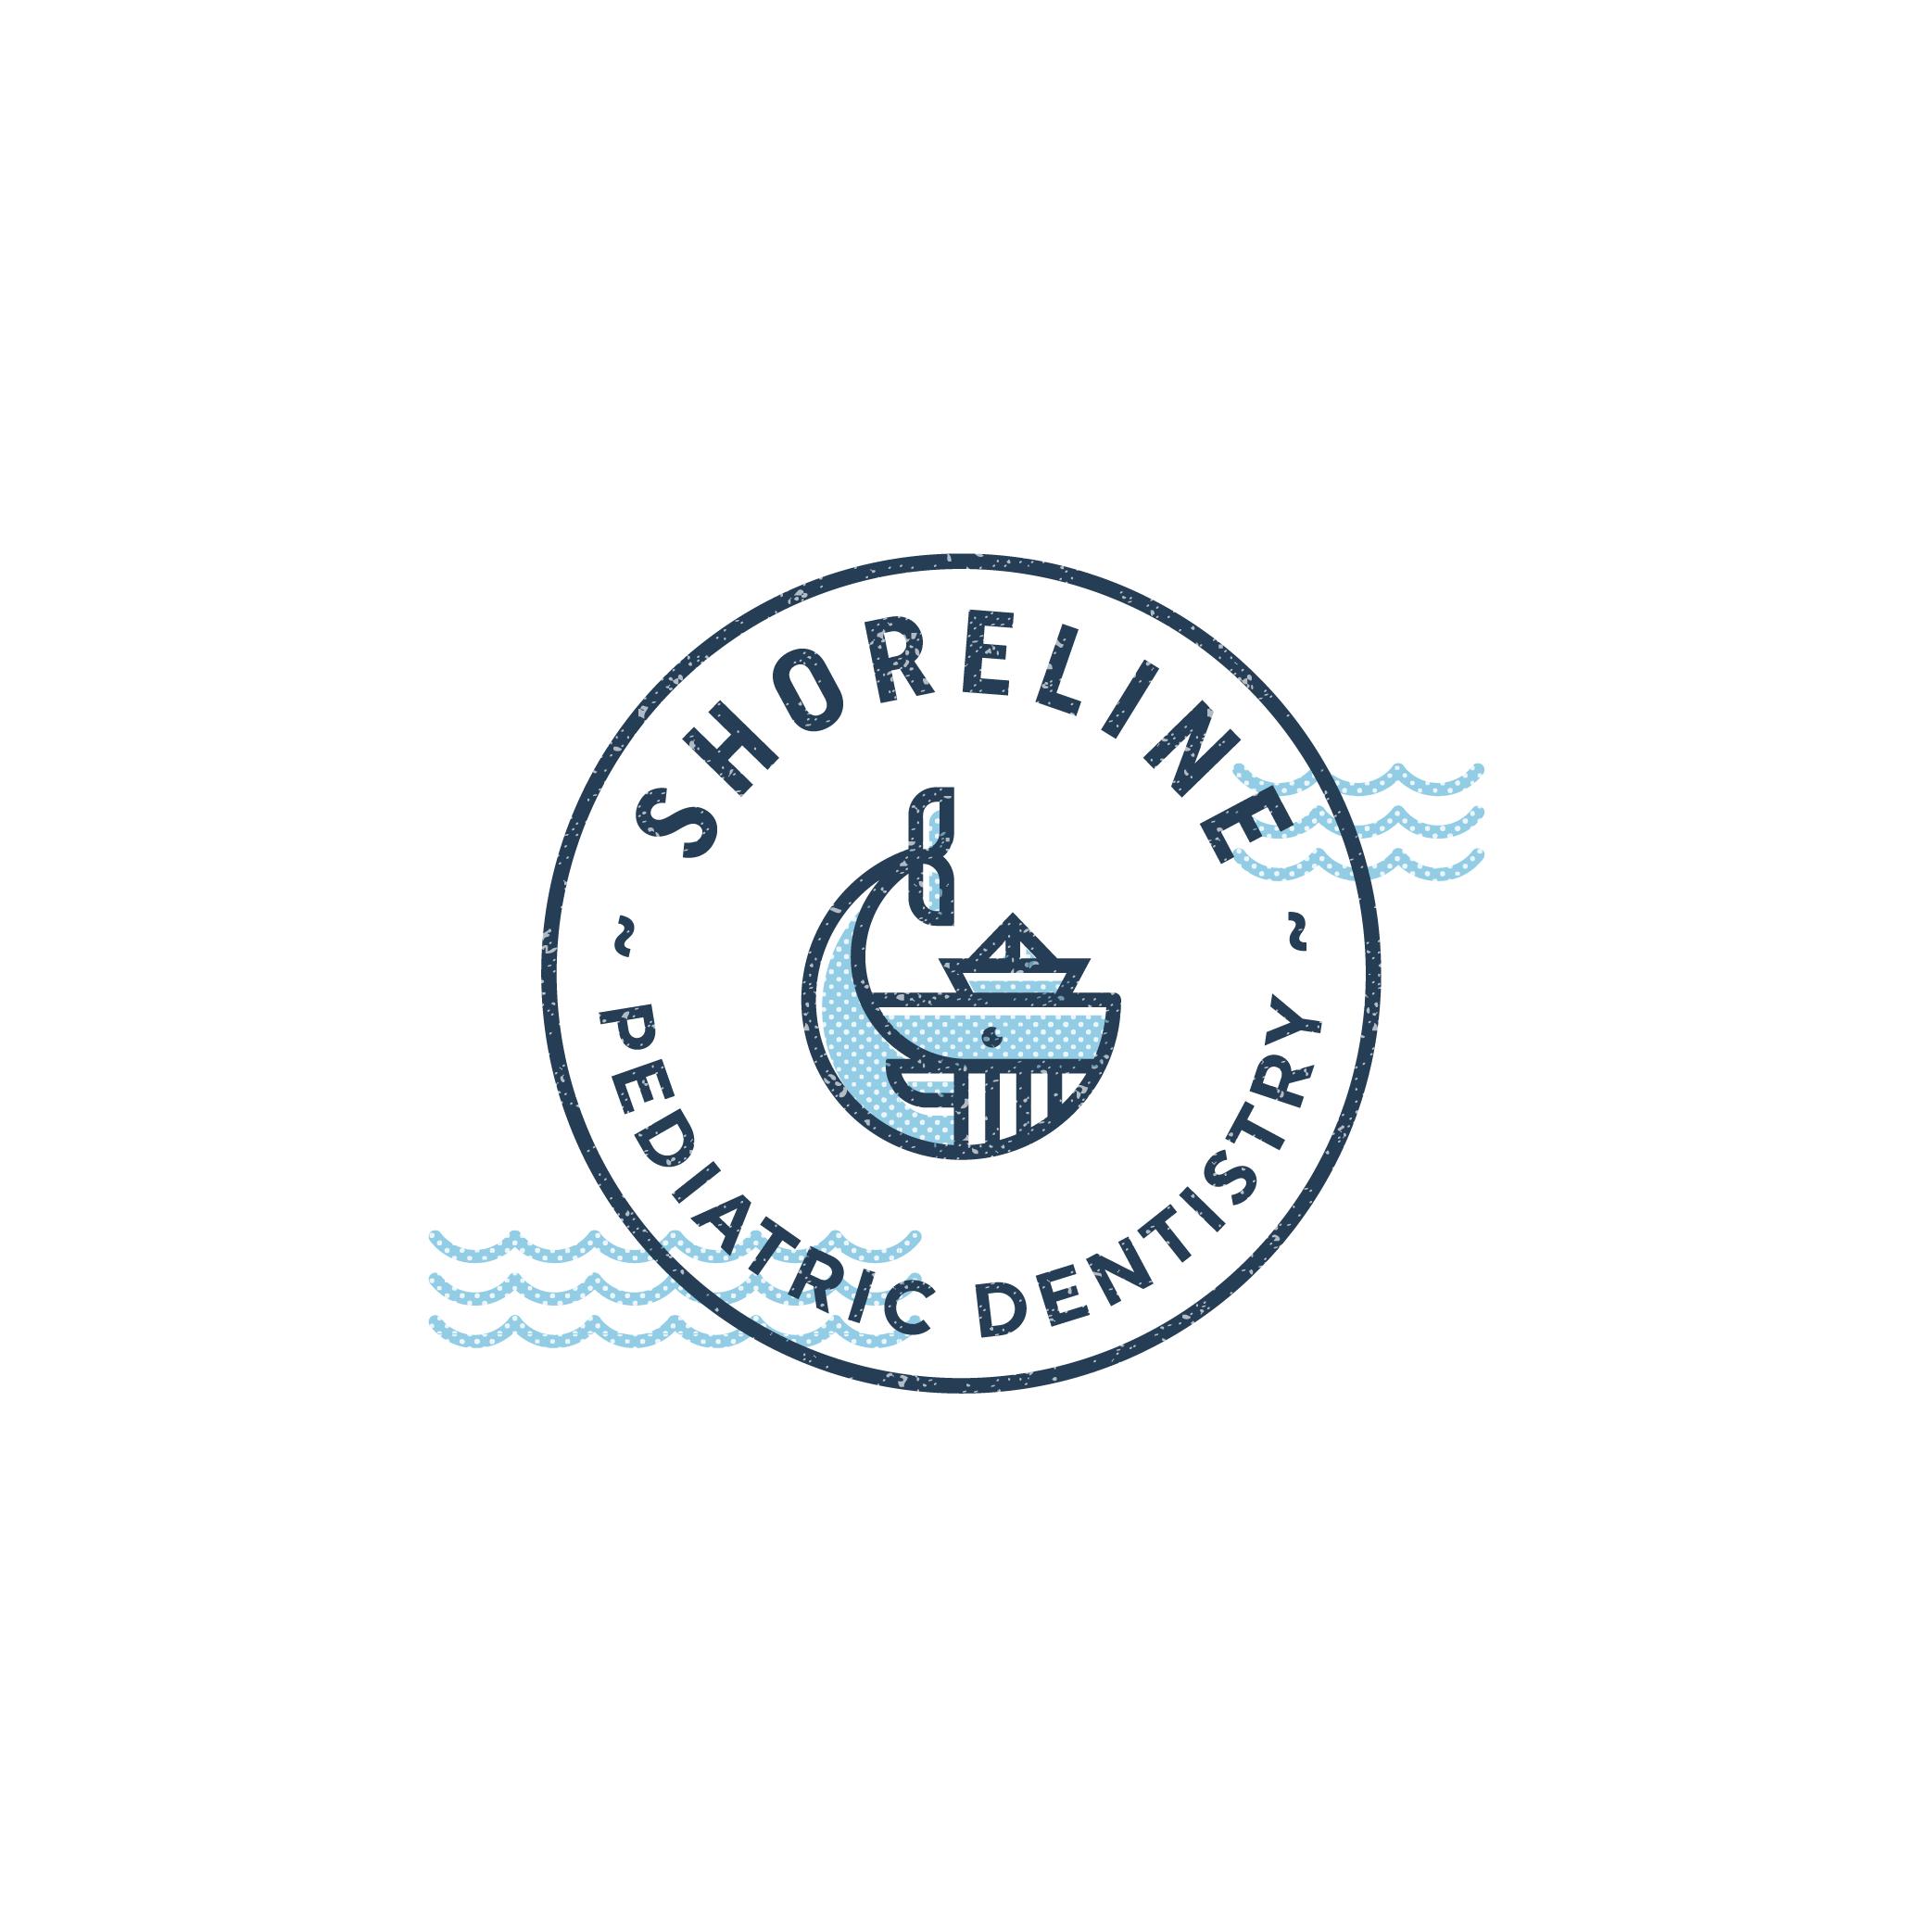 Logo_Collection_090917_Shoreline-02.png